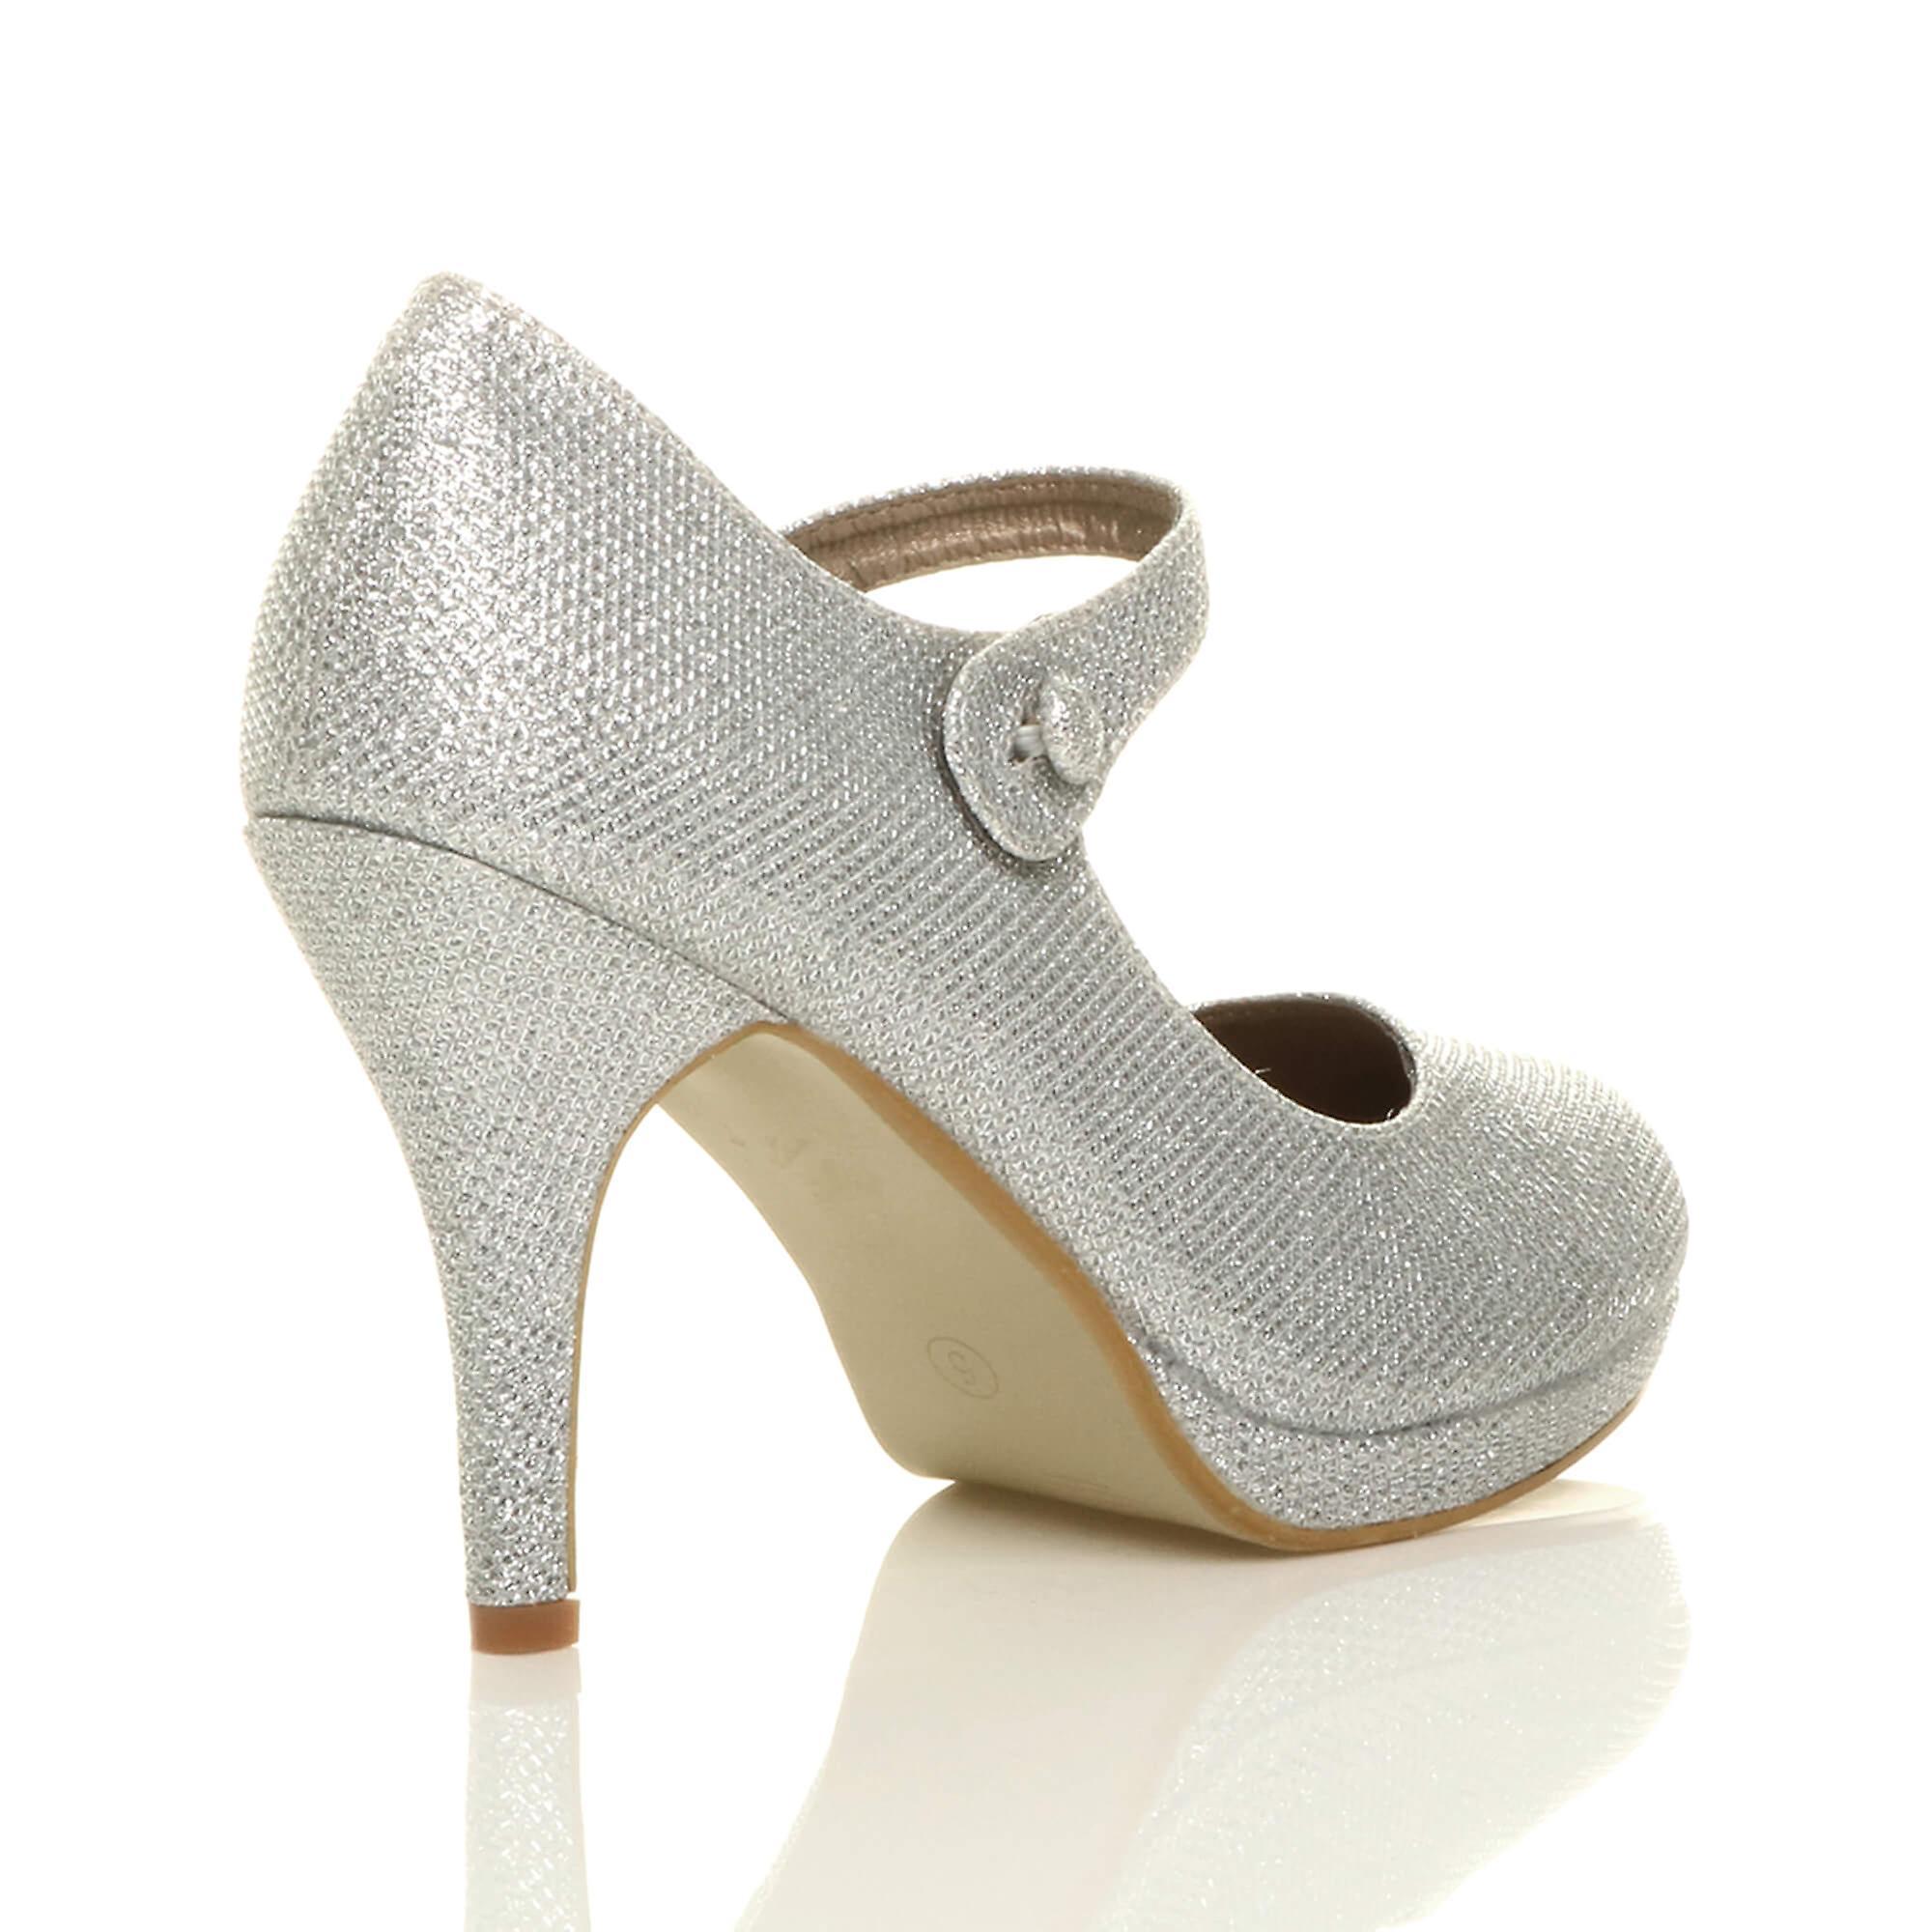 Ajvani womens mid high heel mary jane evening work platform court shoes